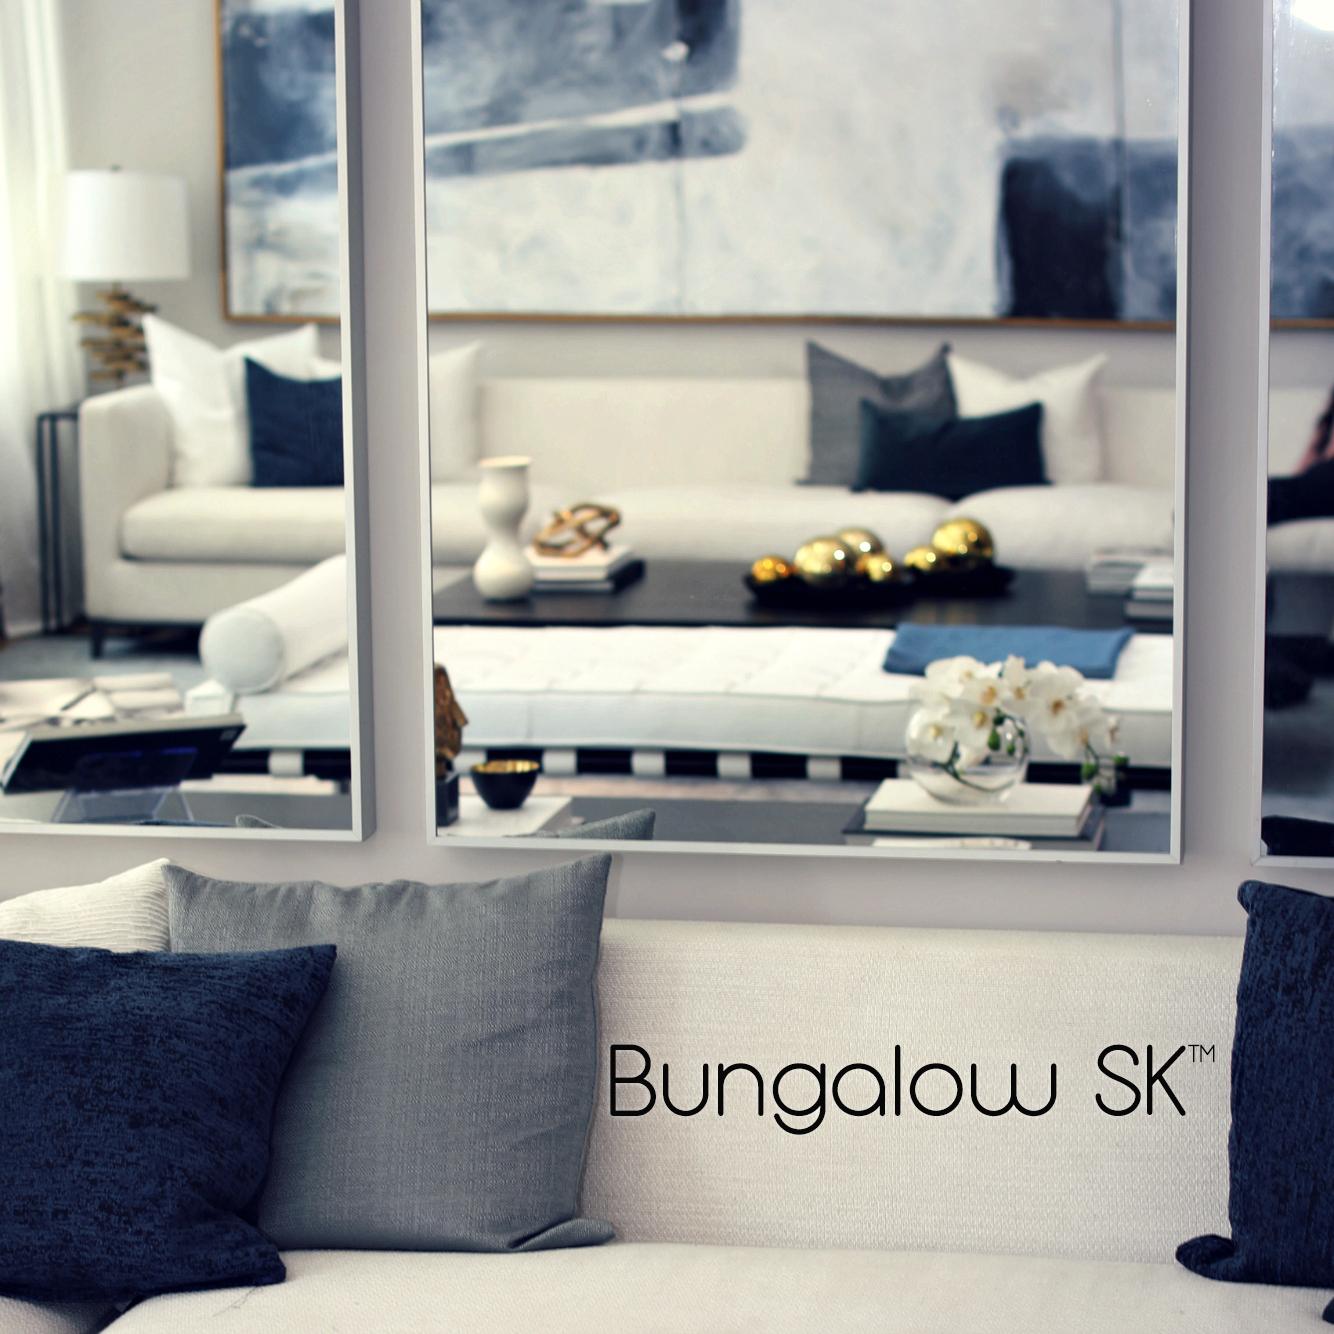 Bungalow SK.jpg